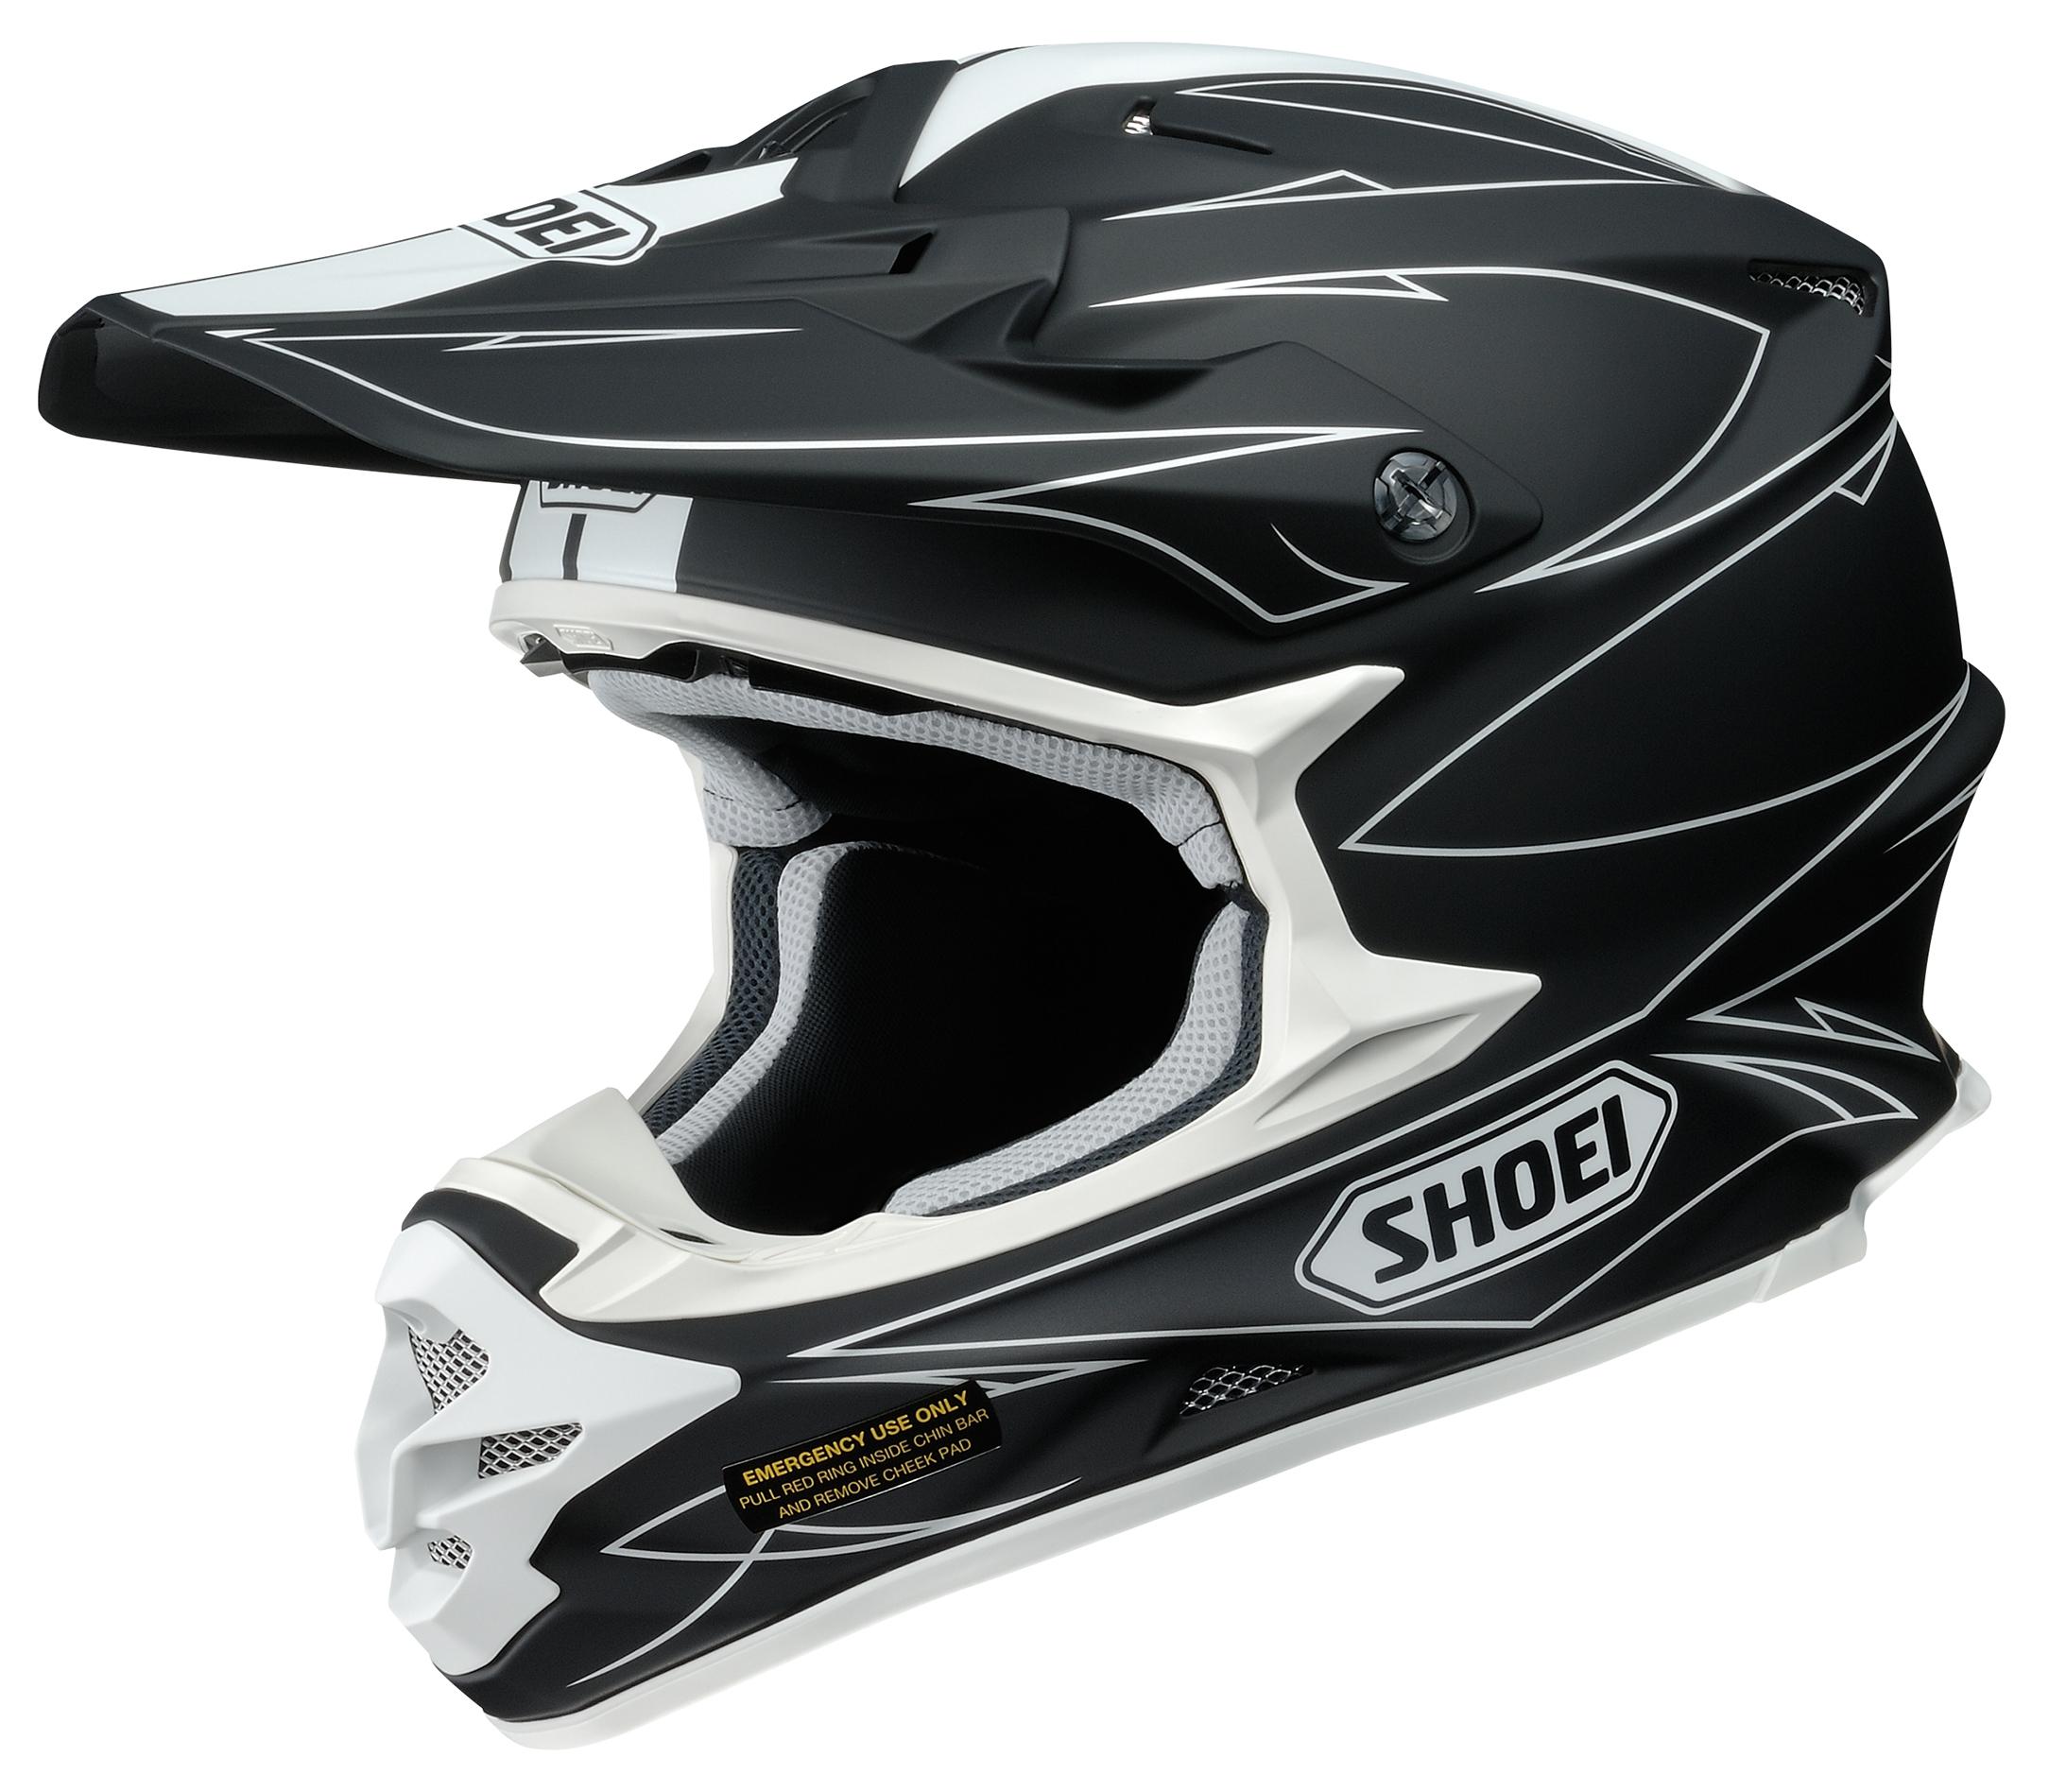 shoei vfx w hectic helmet 20 off revzilla. Black Bedroom Furniture Sets. Home Design Ideas